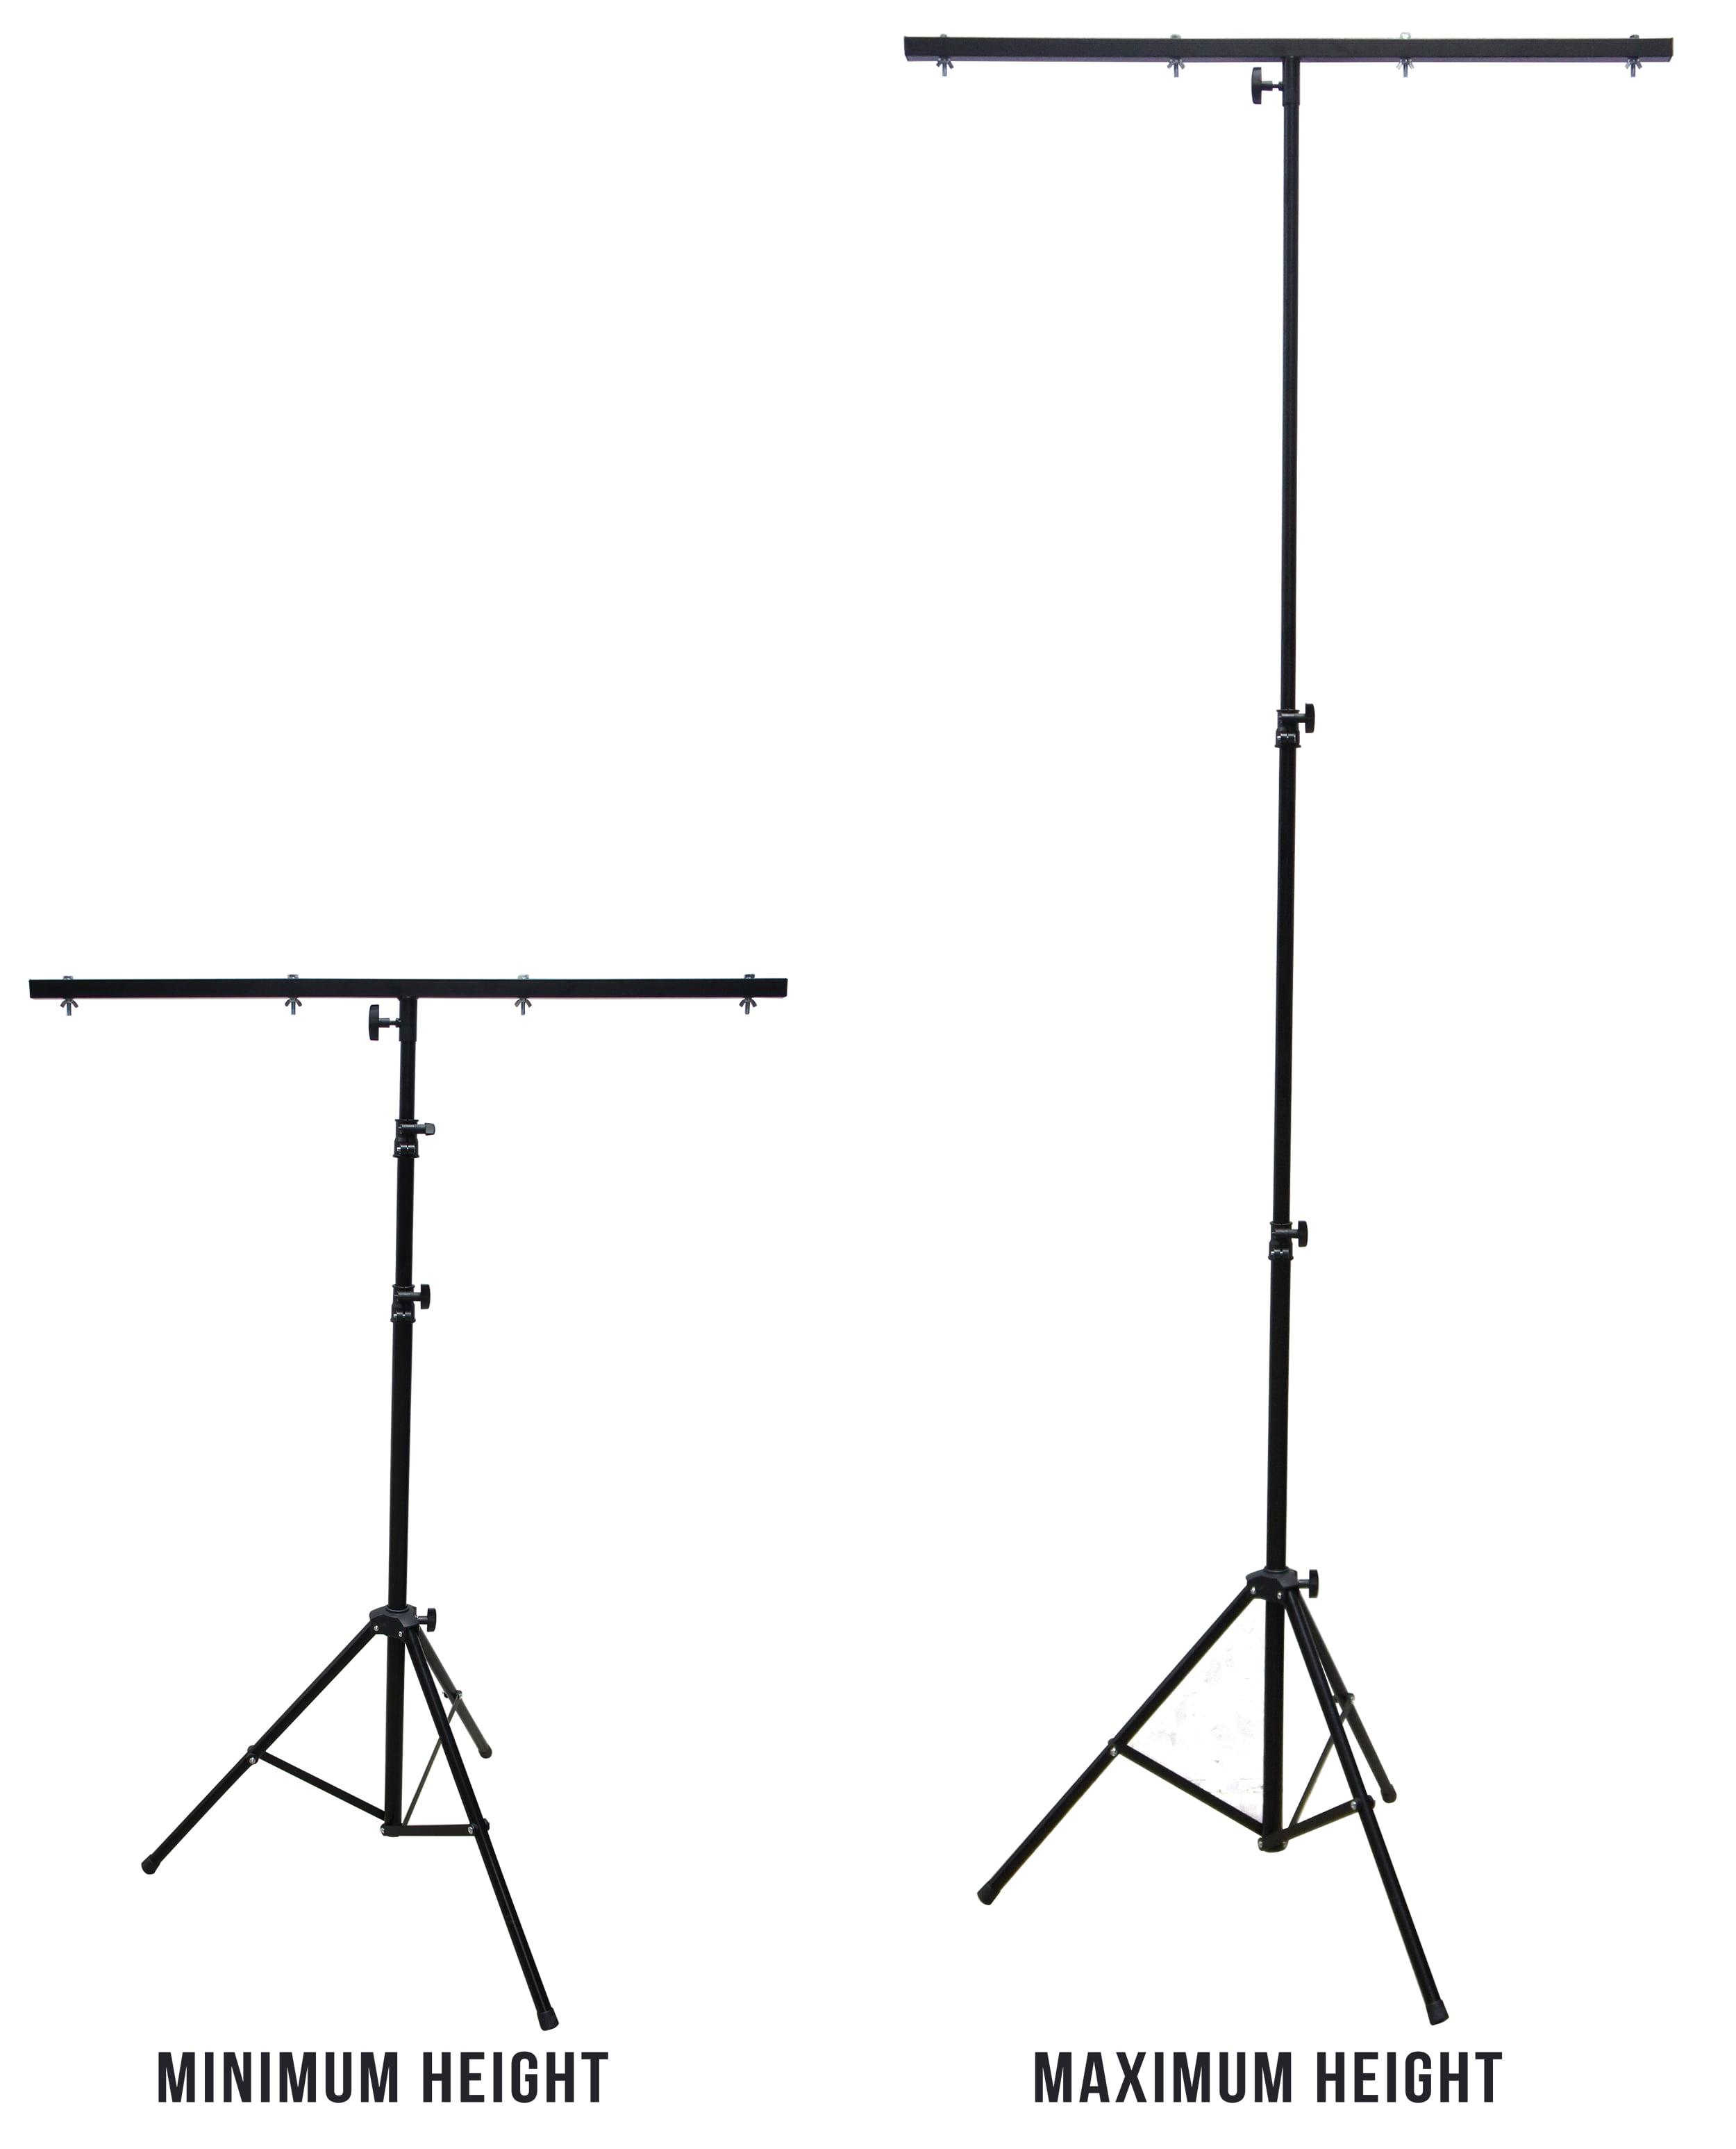 Harmony Audio HA-TBARSTAND Pro DJ Lighting Tripod & T-Bar Portable Light Stand by Harmony Audio Stands